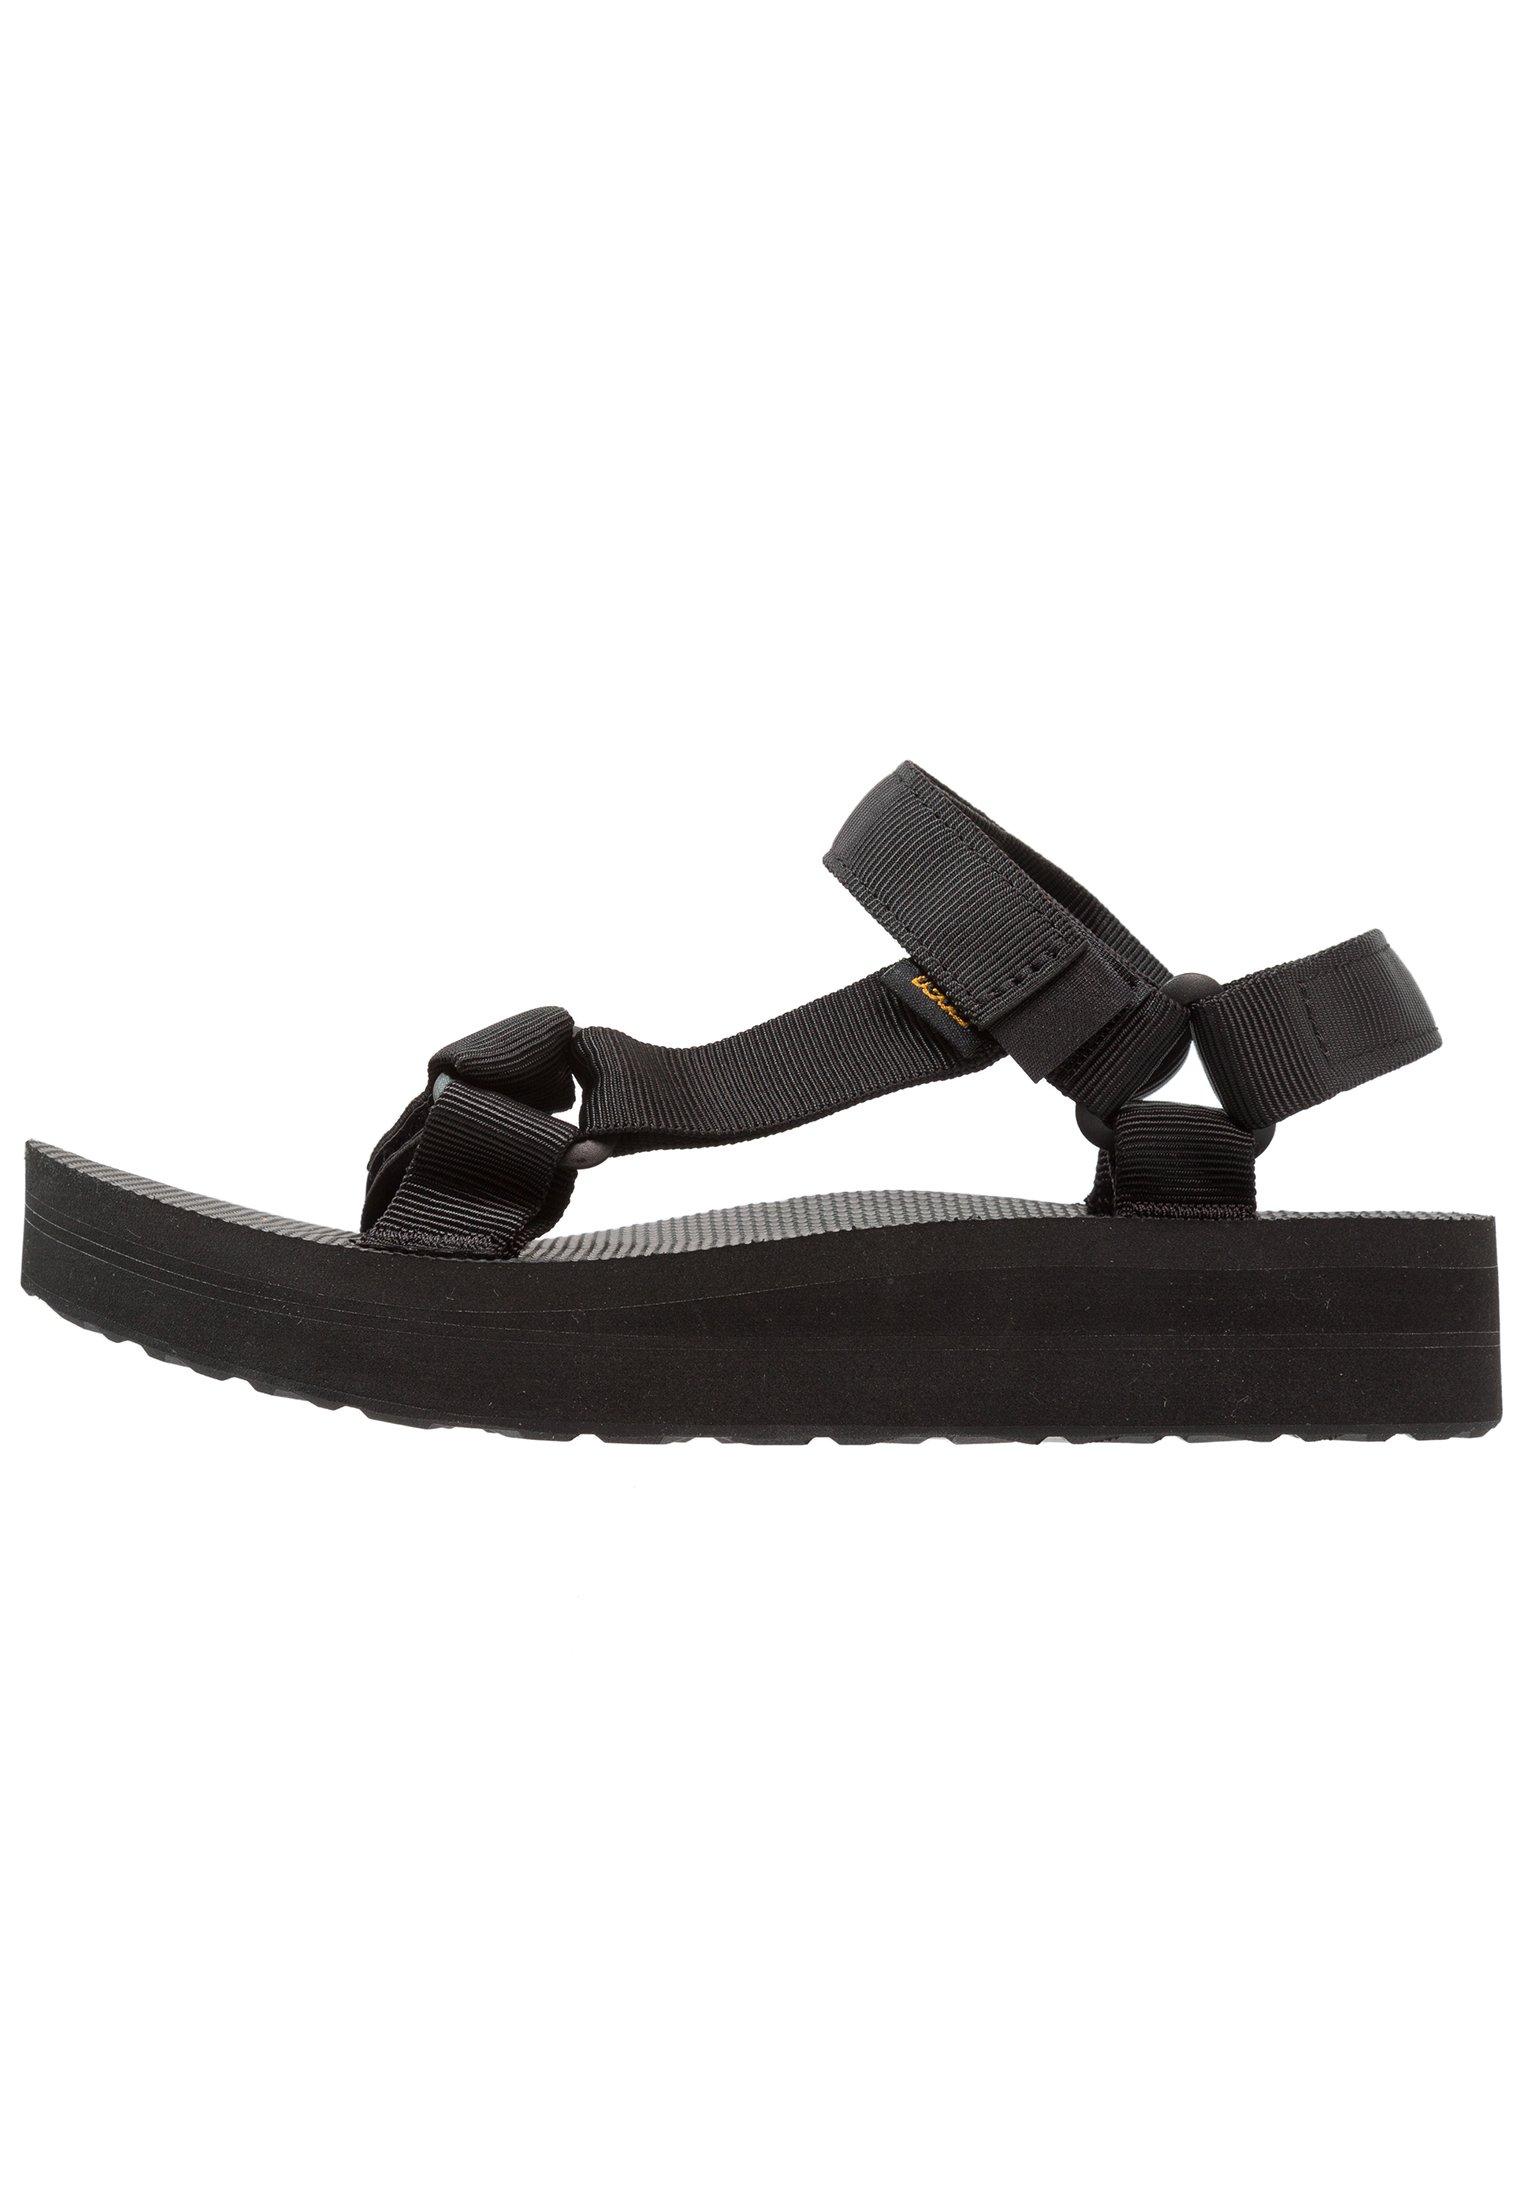 Women MIDFORM UNIVERSAL - Walking sandals - black